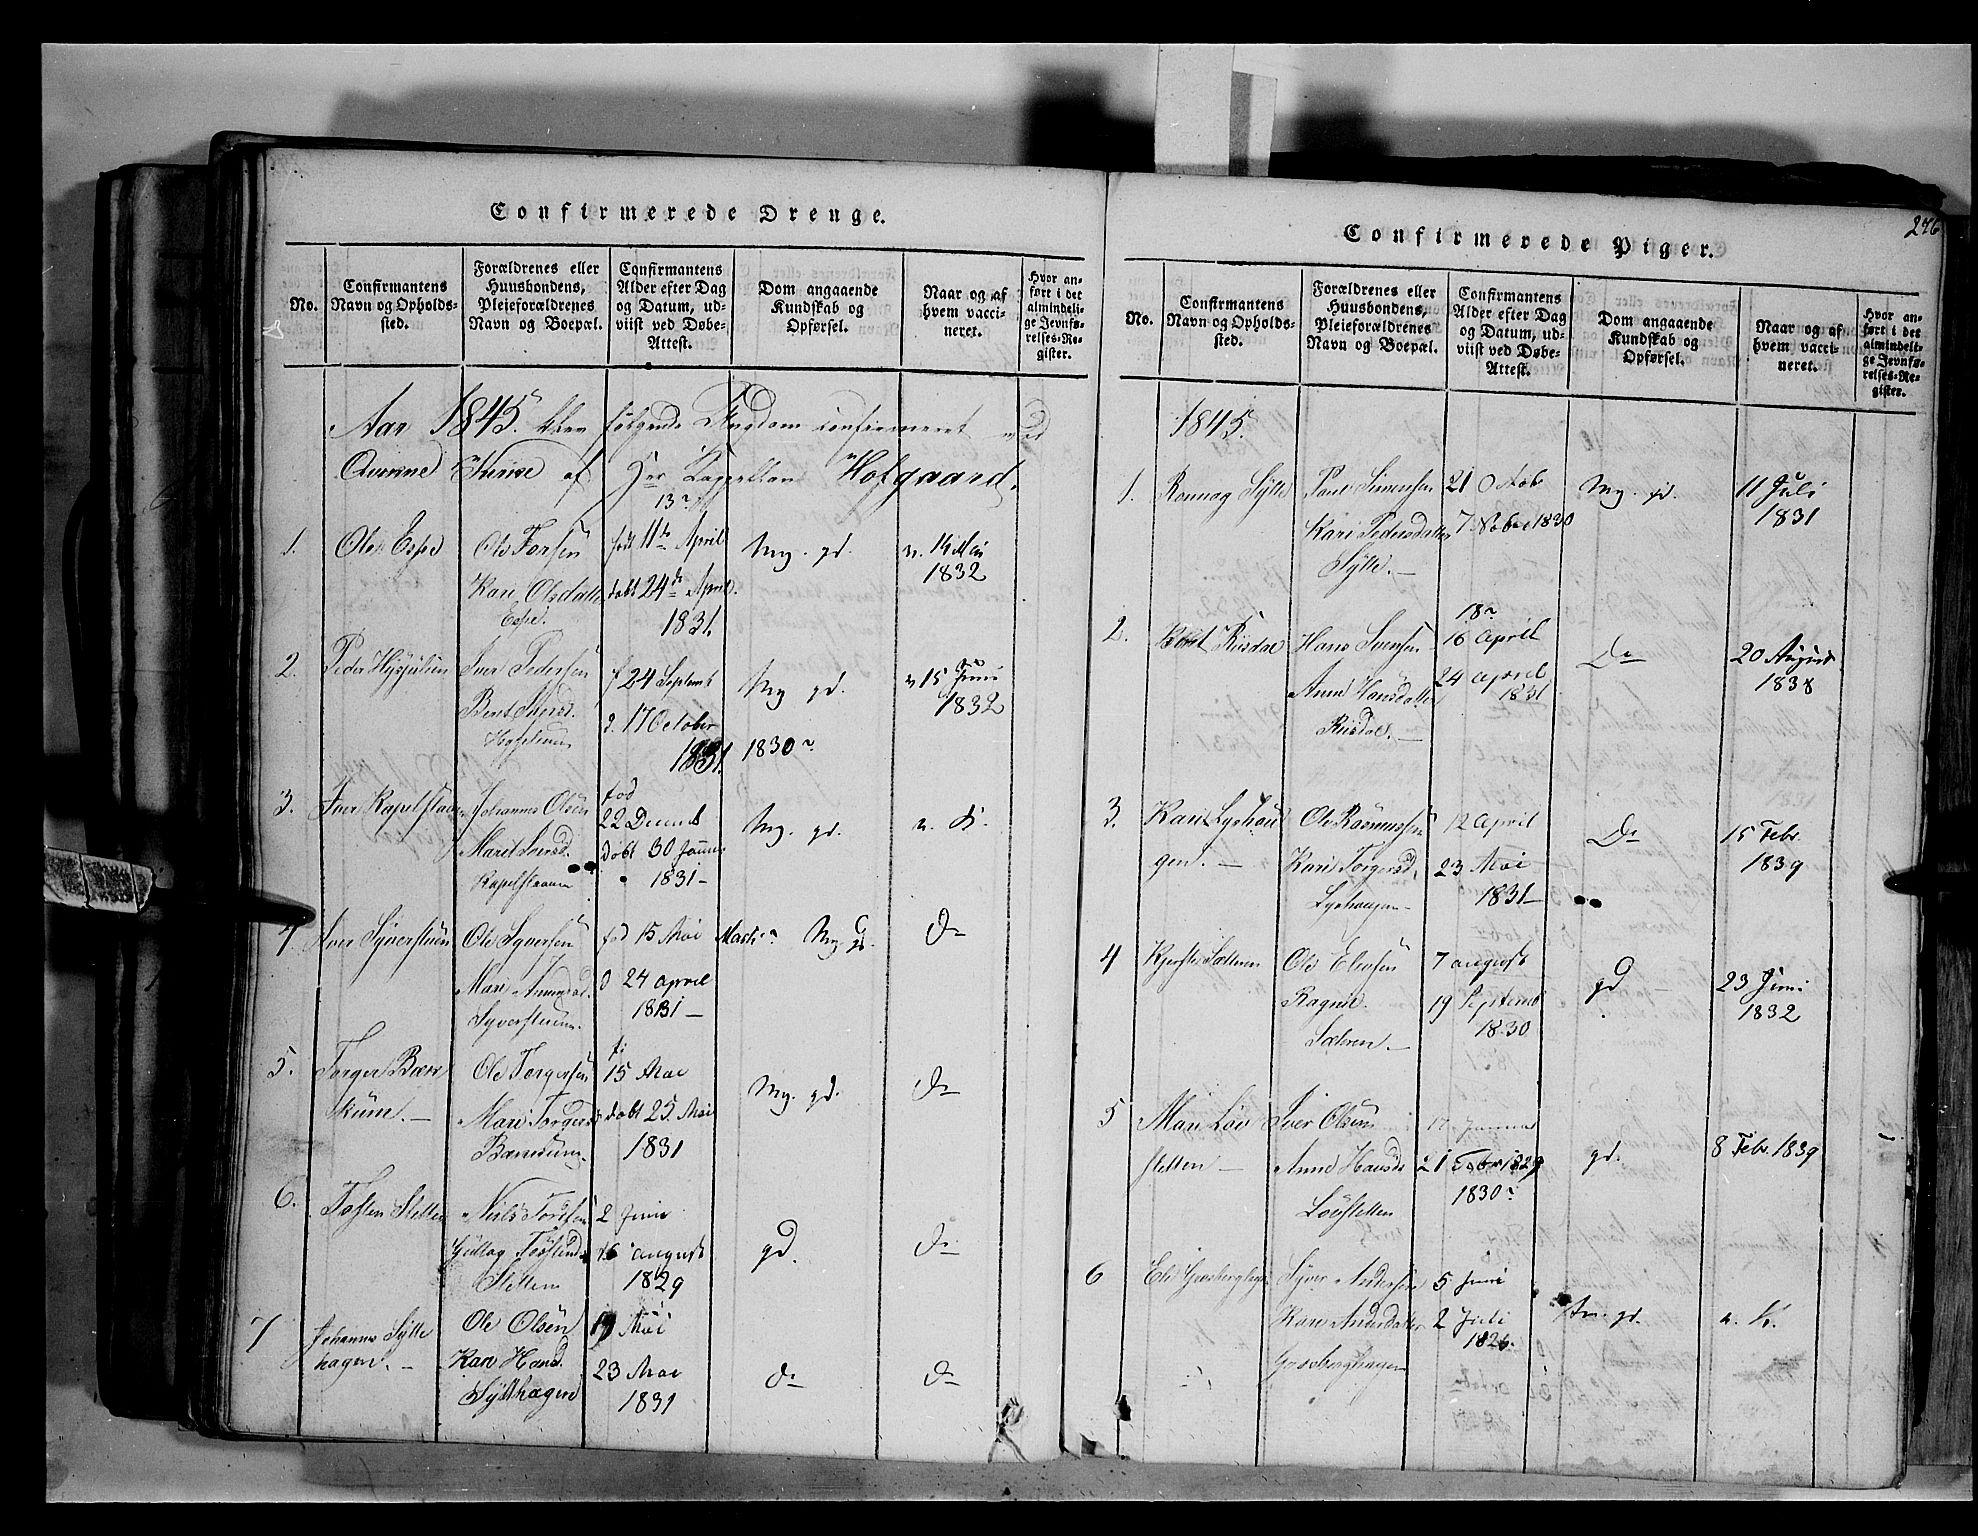 SAH, Fron prestekontor, H/Ha/Hab/L0003: Klokkerbok nr. 3, 1816-1850, s. 276